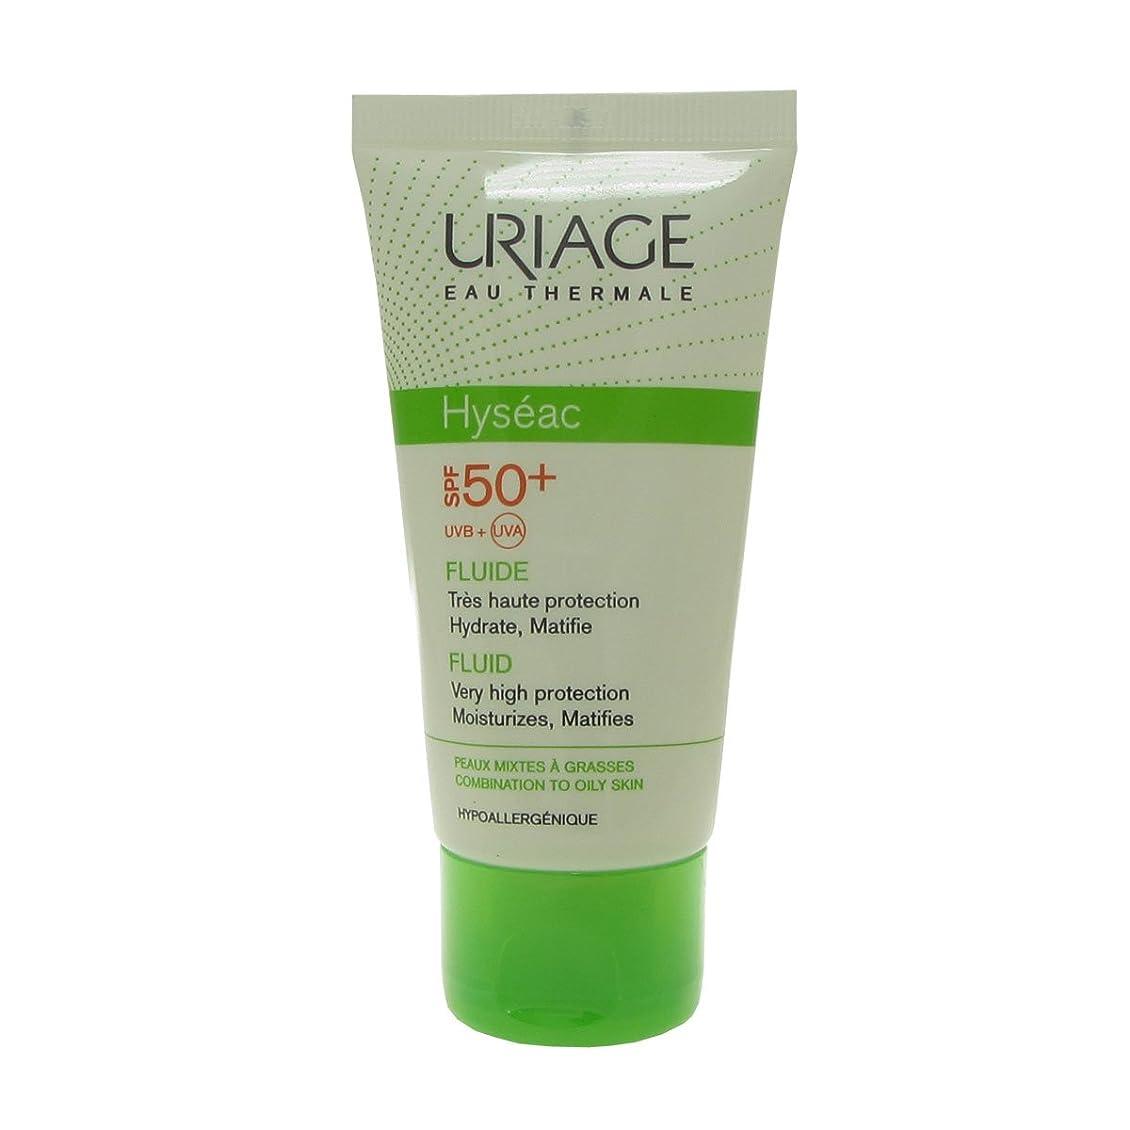 神抑制効率的にUriage Hyseac Sunscreen Fluide Spf 50 50ml [並行輸入品]